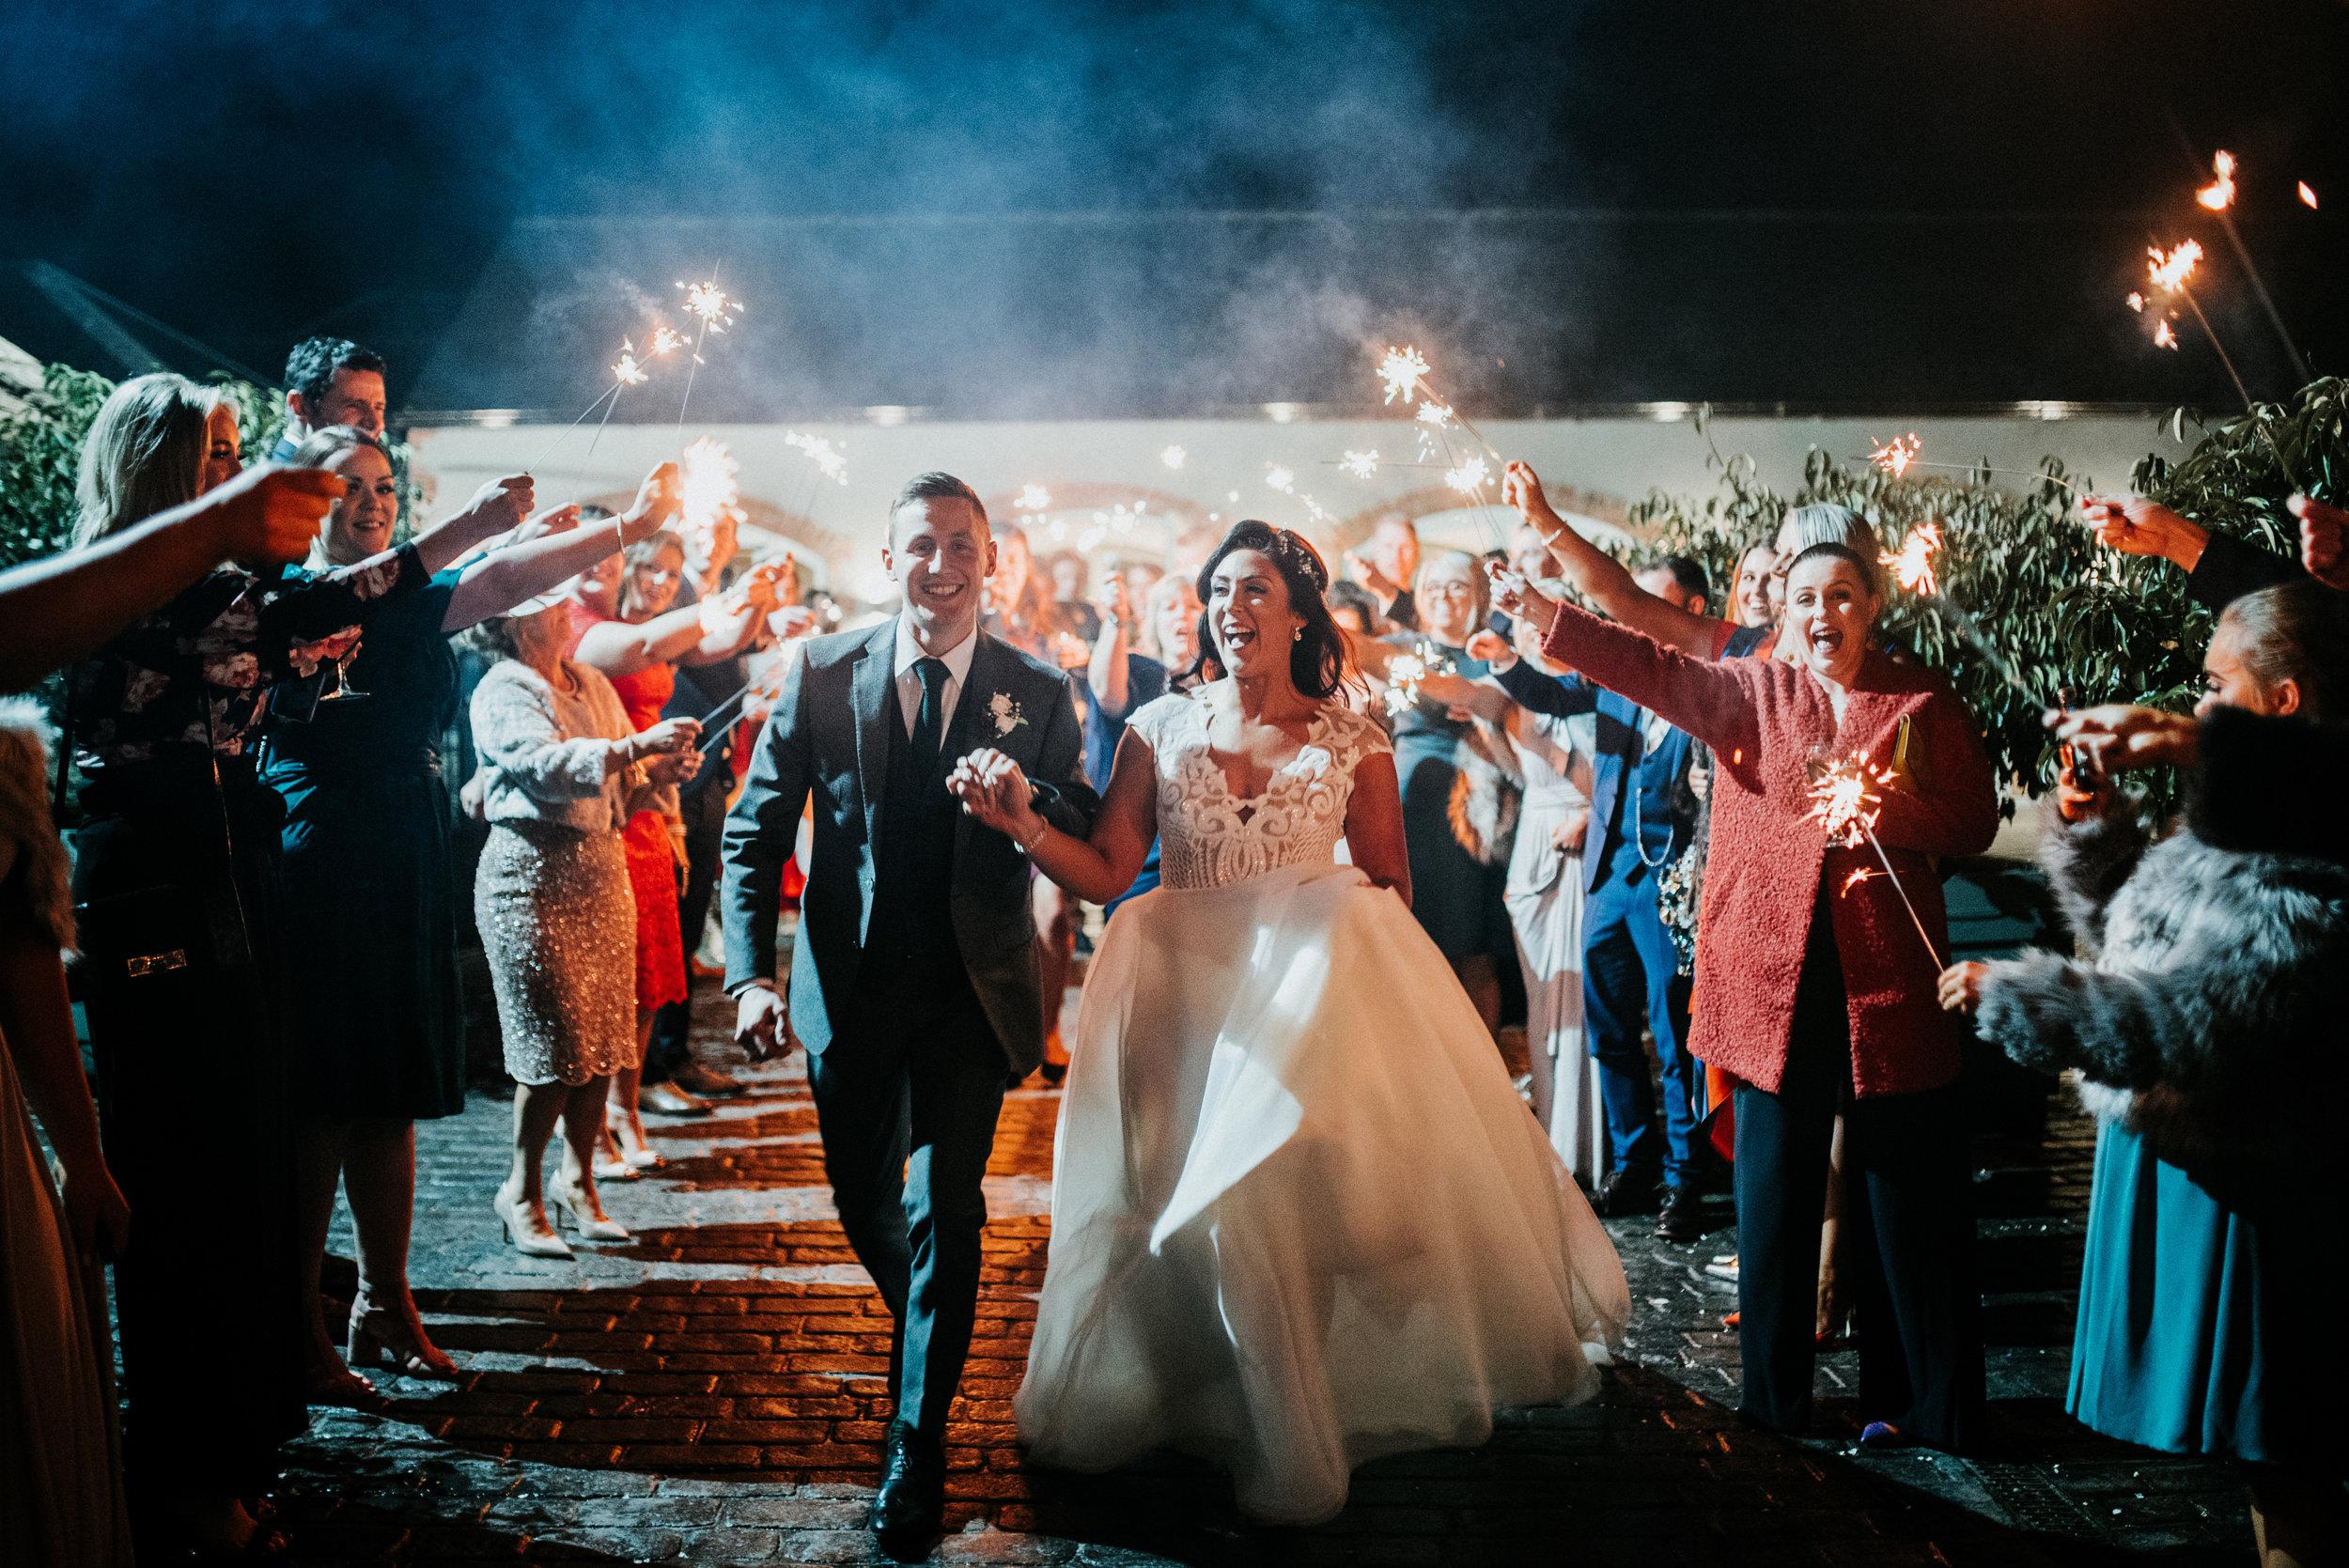 larchfield estate wedding, wedding venues northern ireland, barn wedding venues northern ireland, wedding photos larchfield estate, shane todd wedding, wedding sparklers, irish wedding (2).jpg